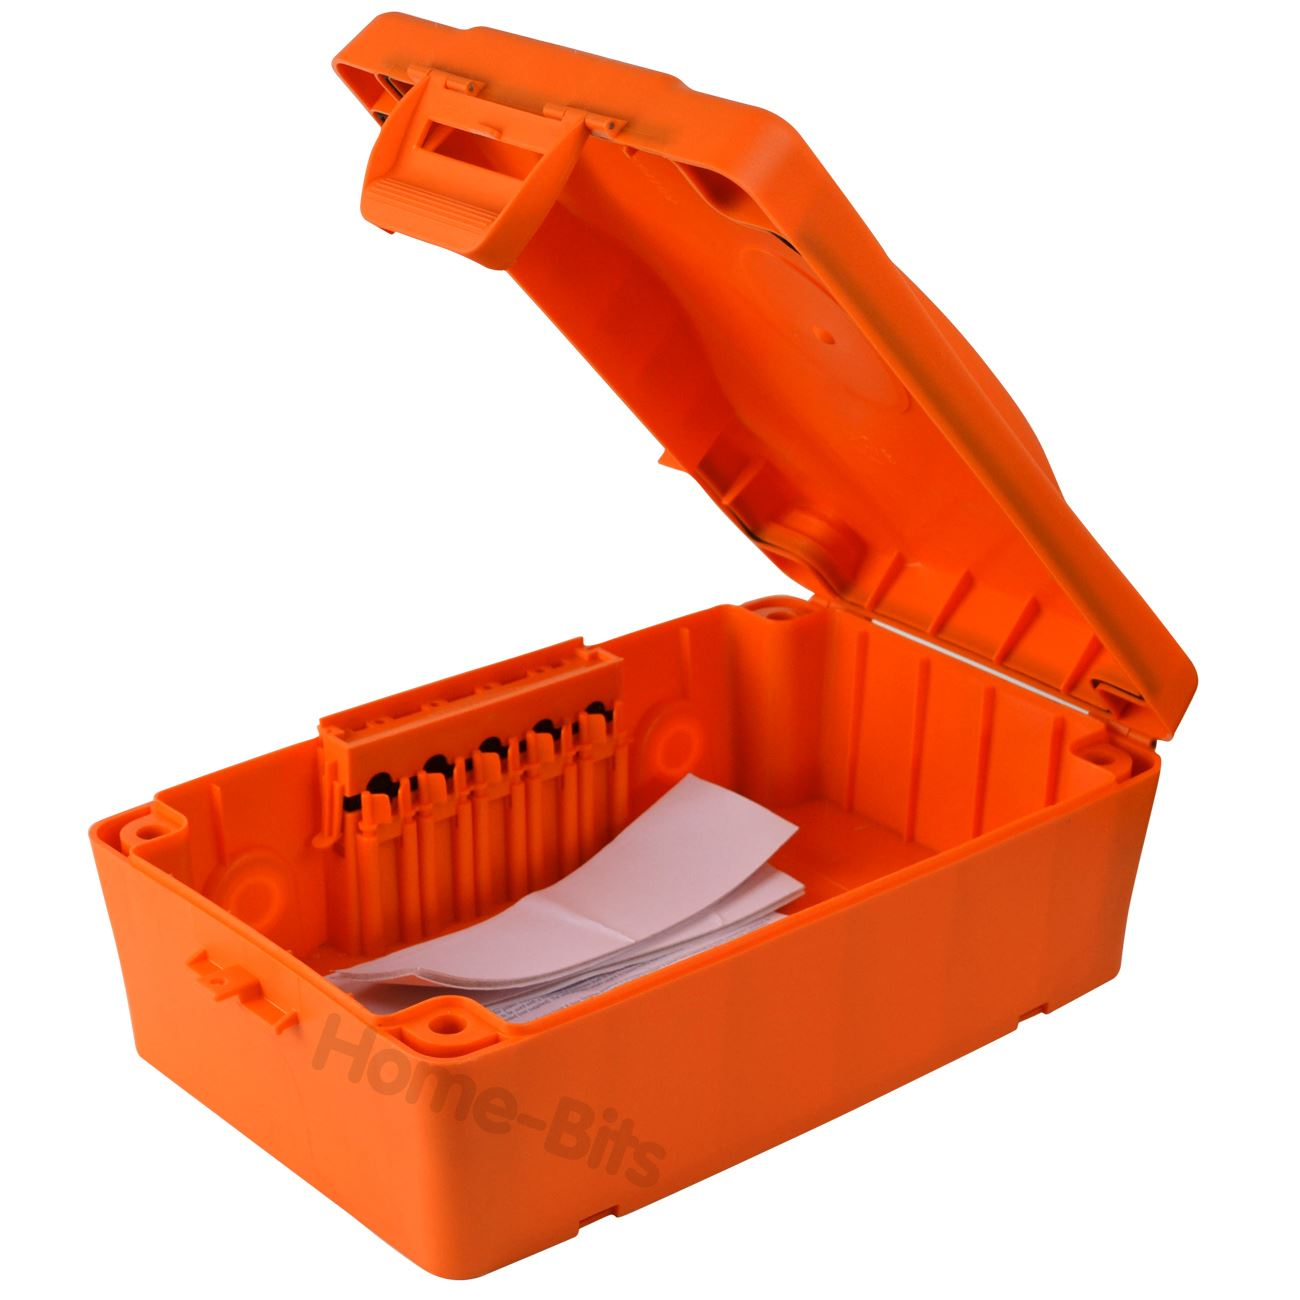 Electrical J Box : Masterplug weatherproof enclosure junction box for outdoor